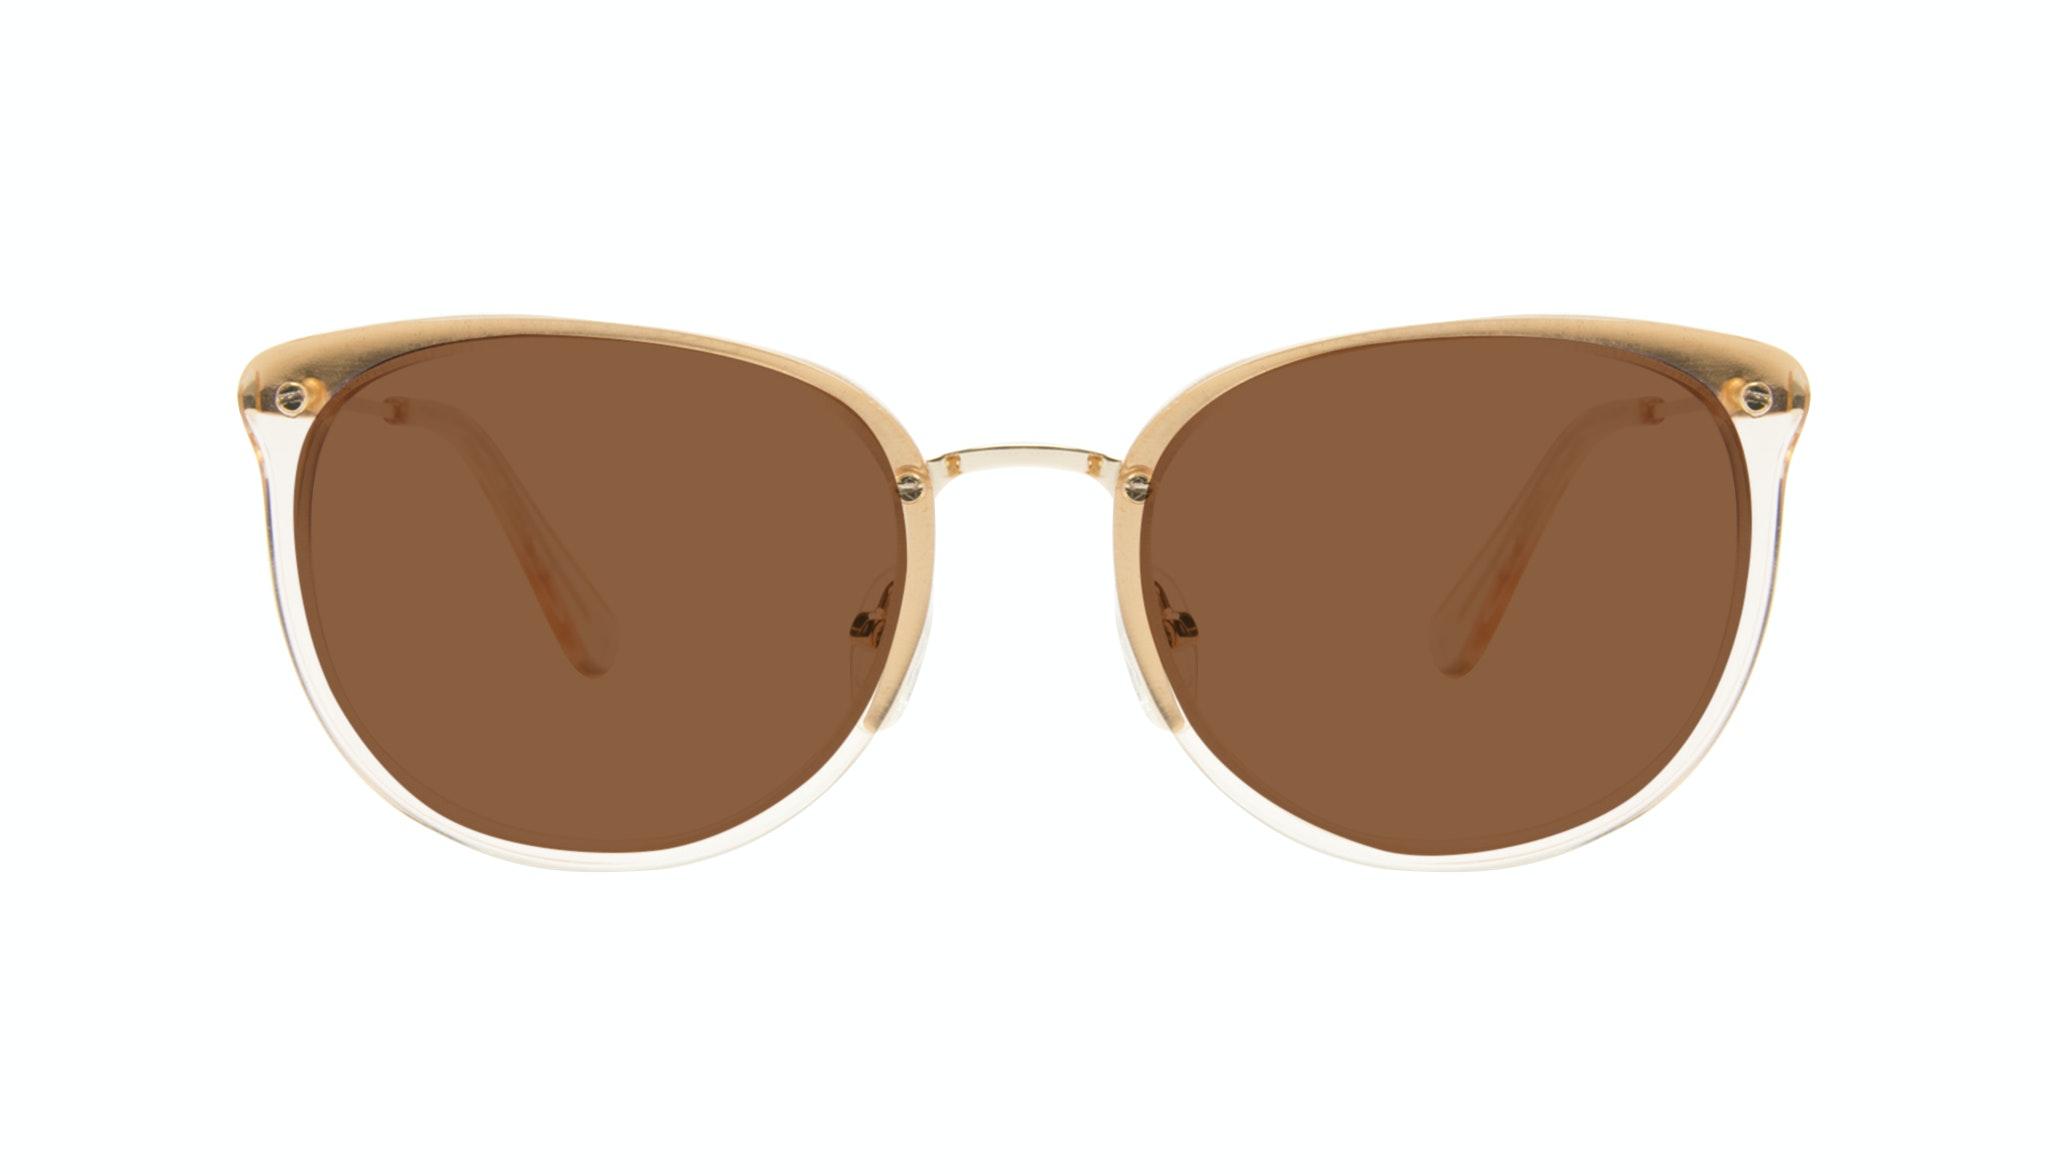 Affordable Fashion Glasses Square Round Sunglasses Women Amaze Blond Metal